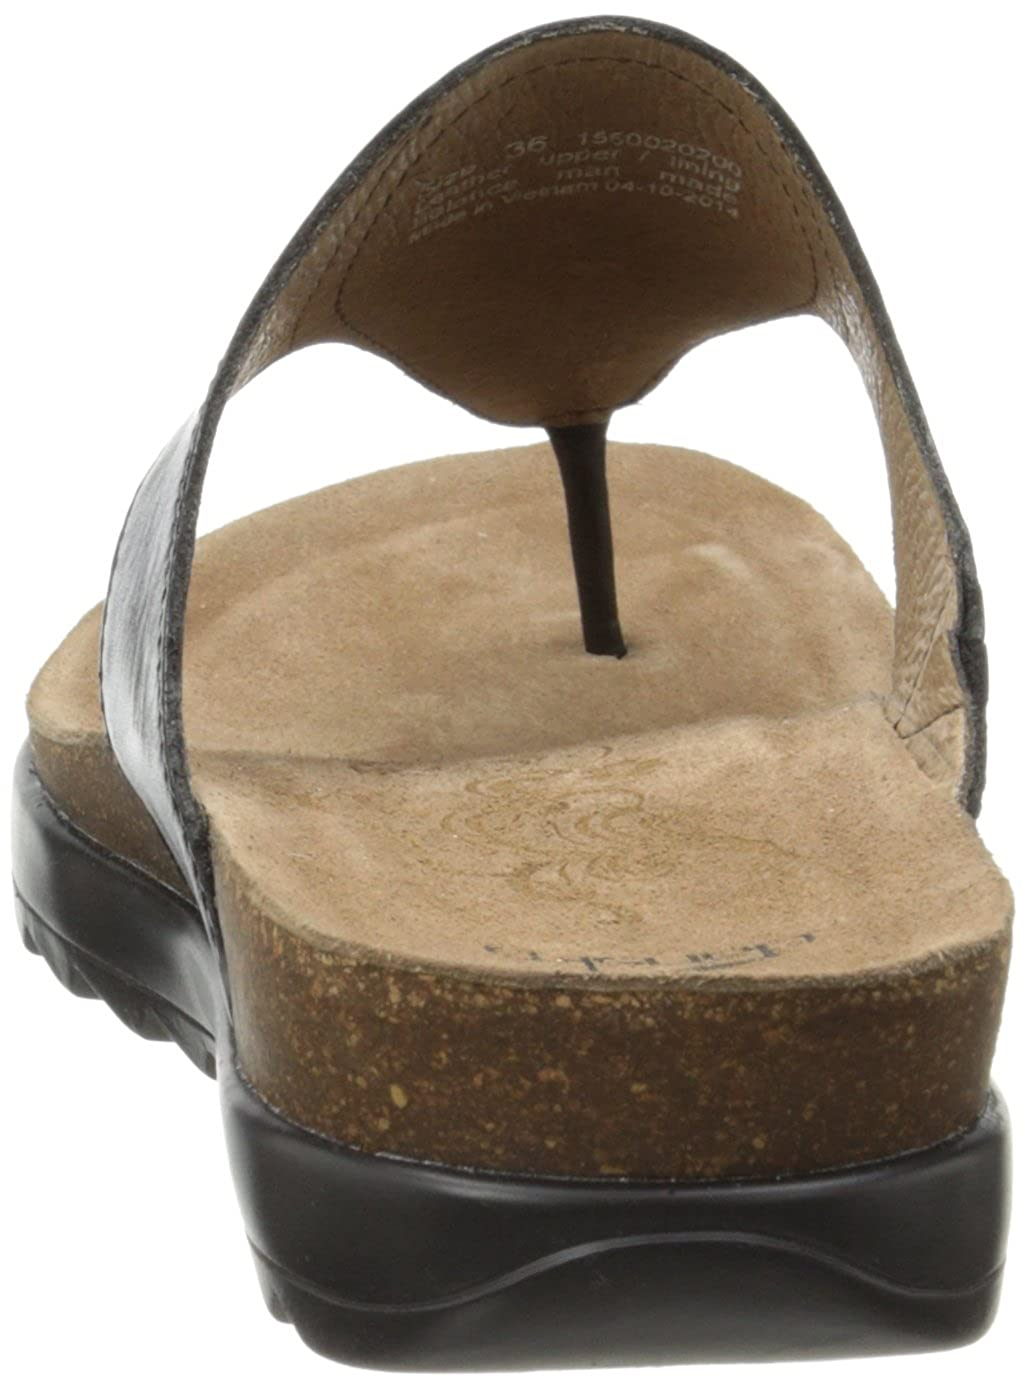 Amazon.com: Dansko Women s Priya vestido sandalia: Shoes